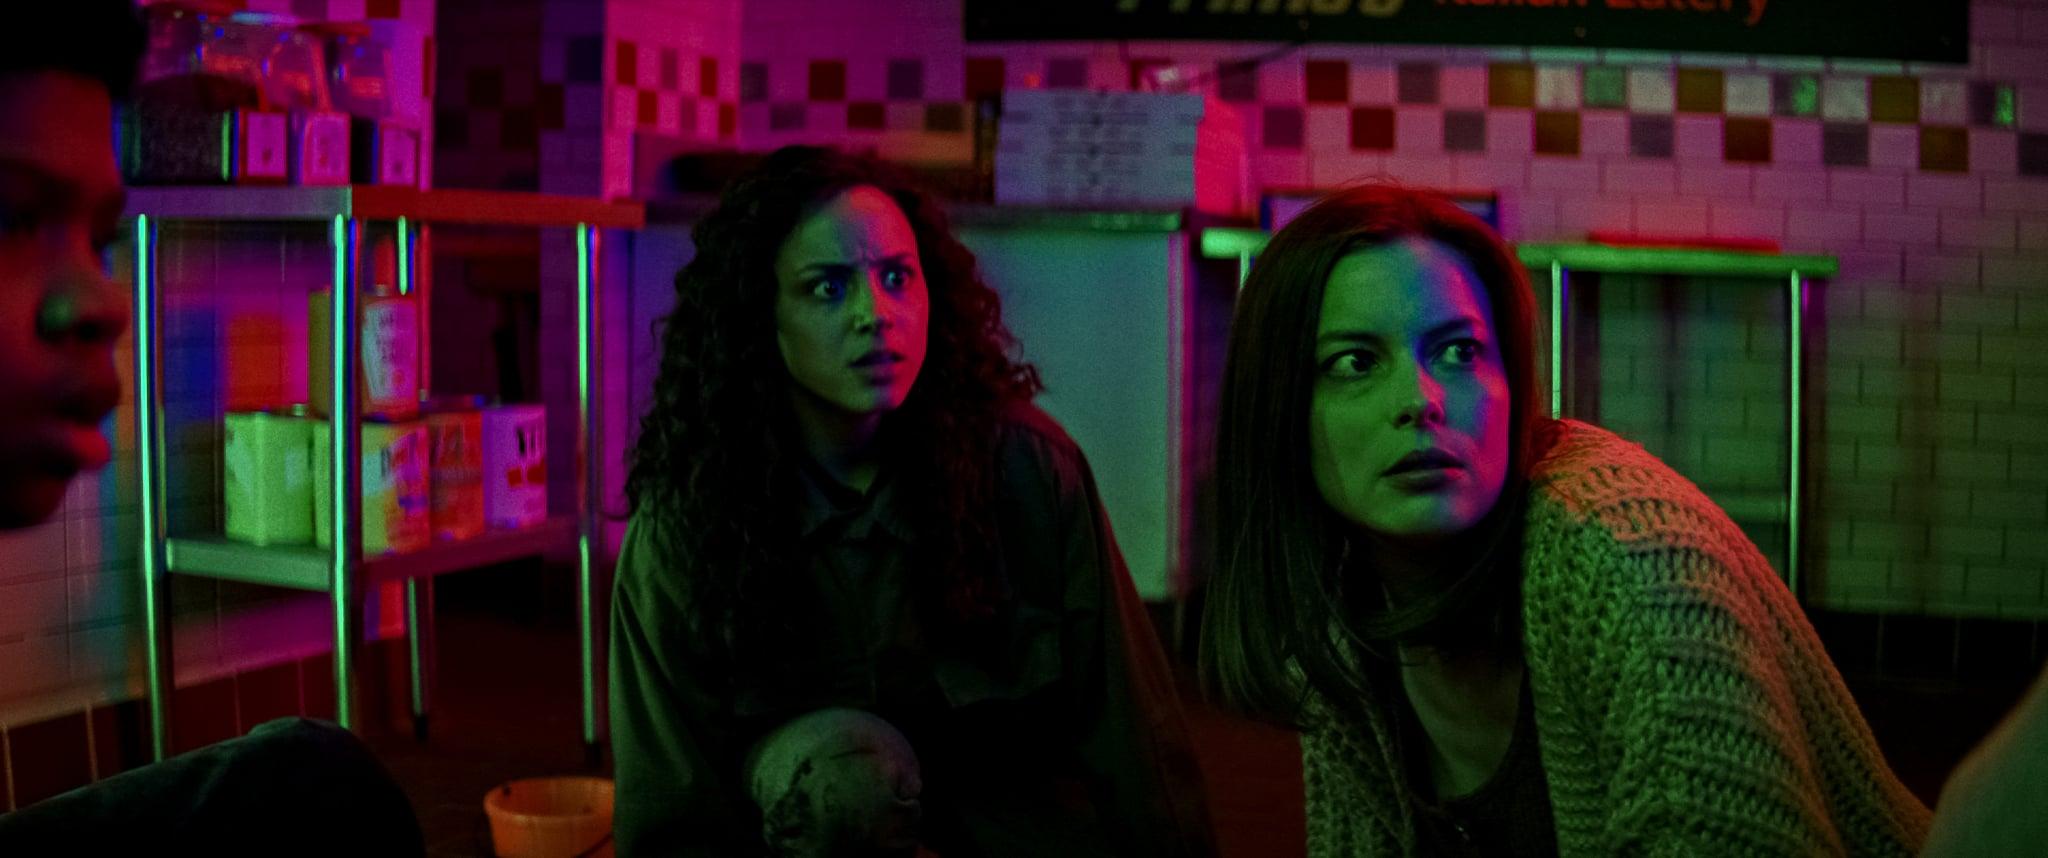 FEAR STREET PART 3: 1666 (L to R) KIANA MADEIRA as DEENA and GILLIAN JACOBS AS C.BERMAN. NETFLIX © 2021